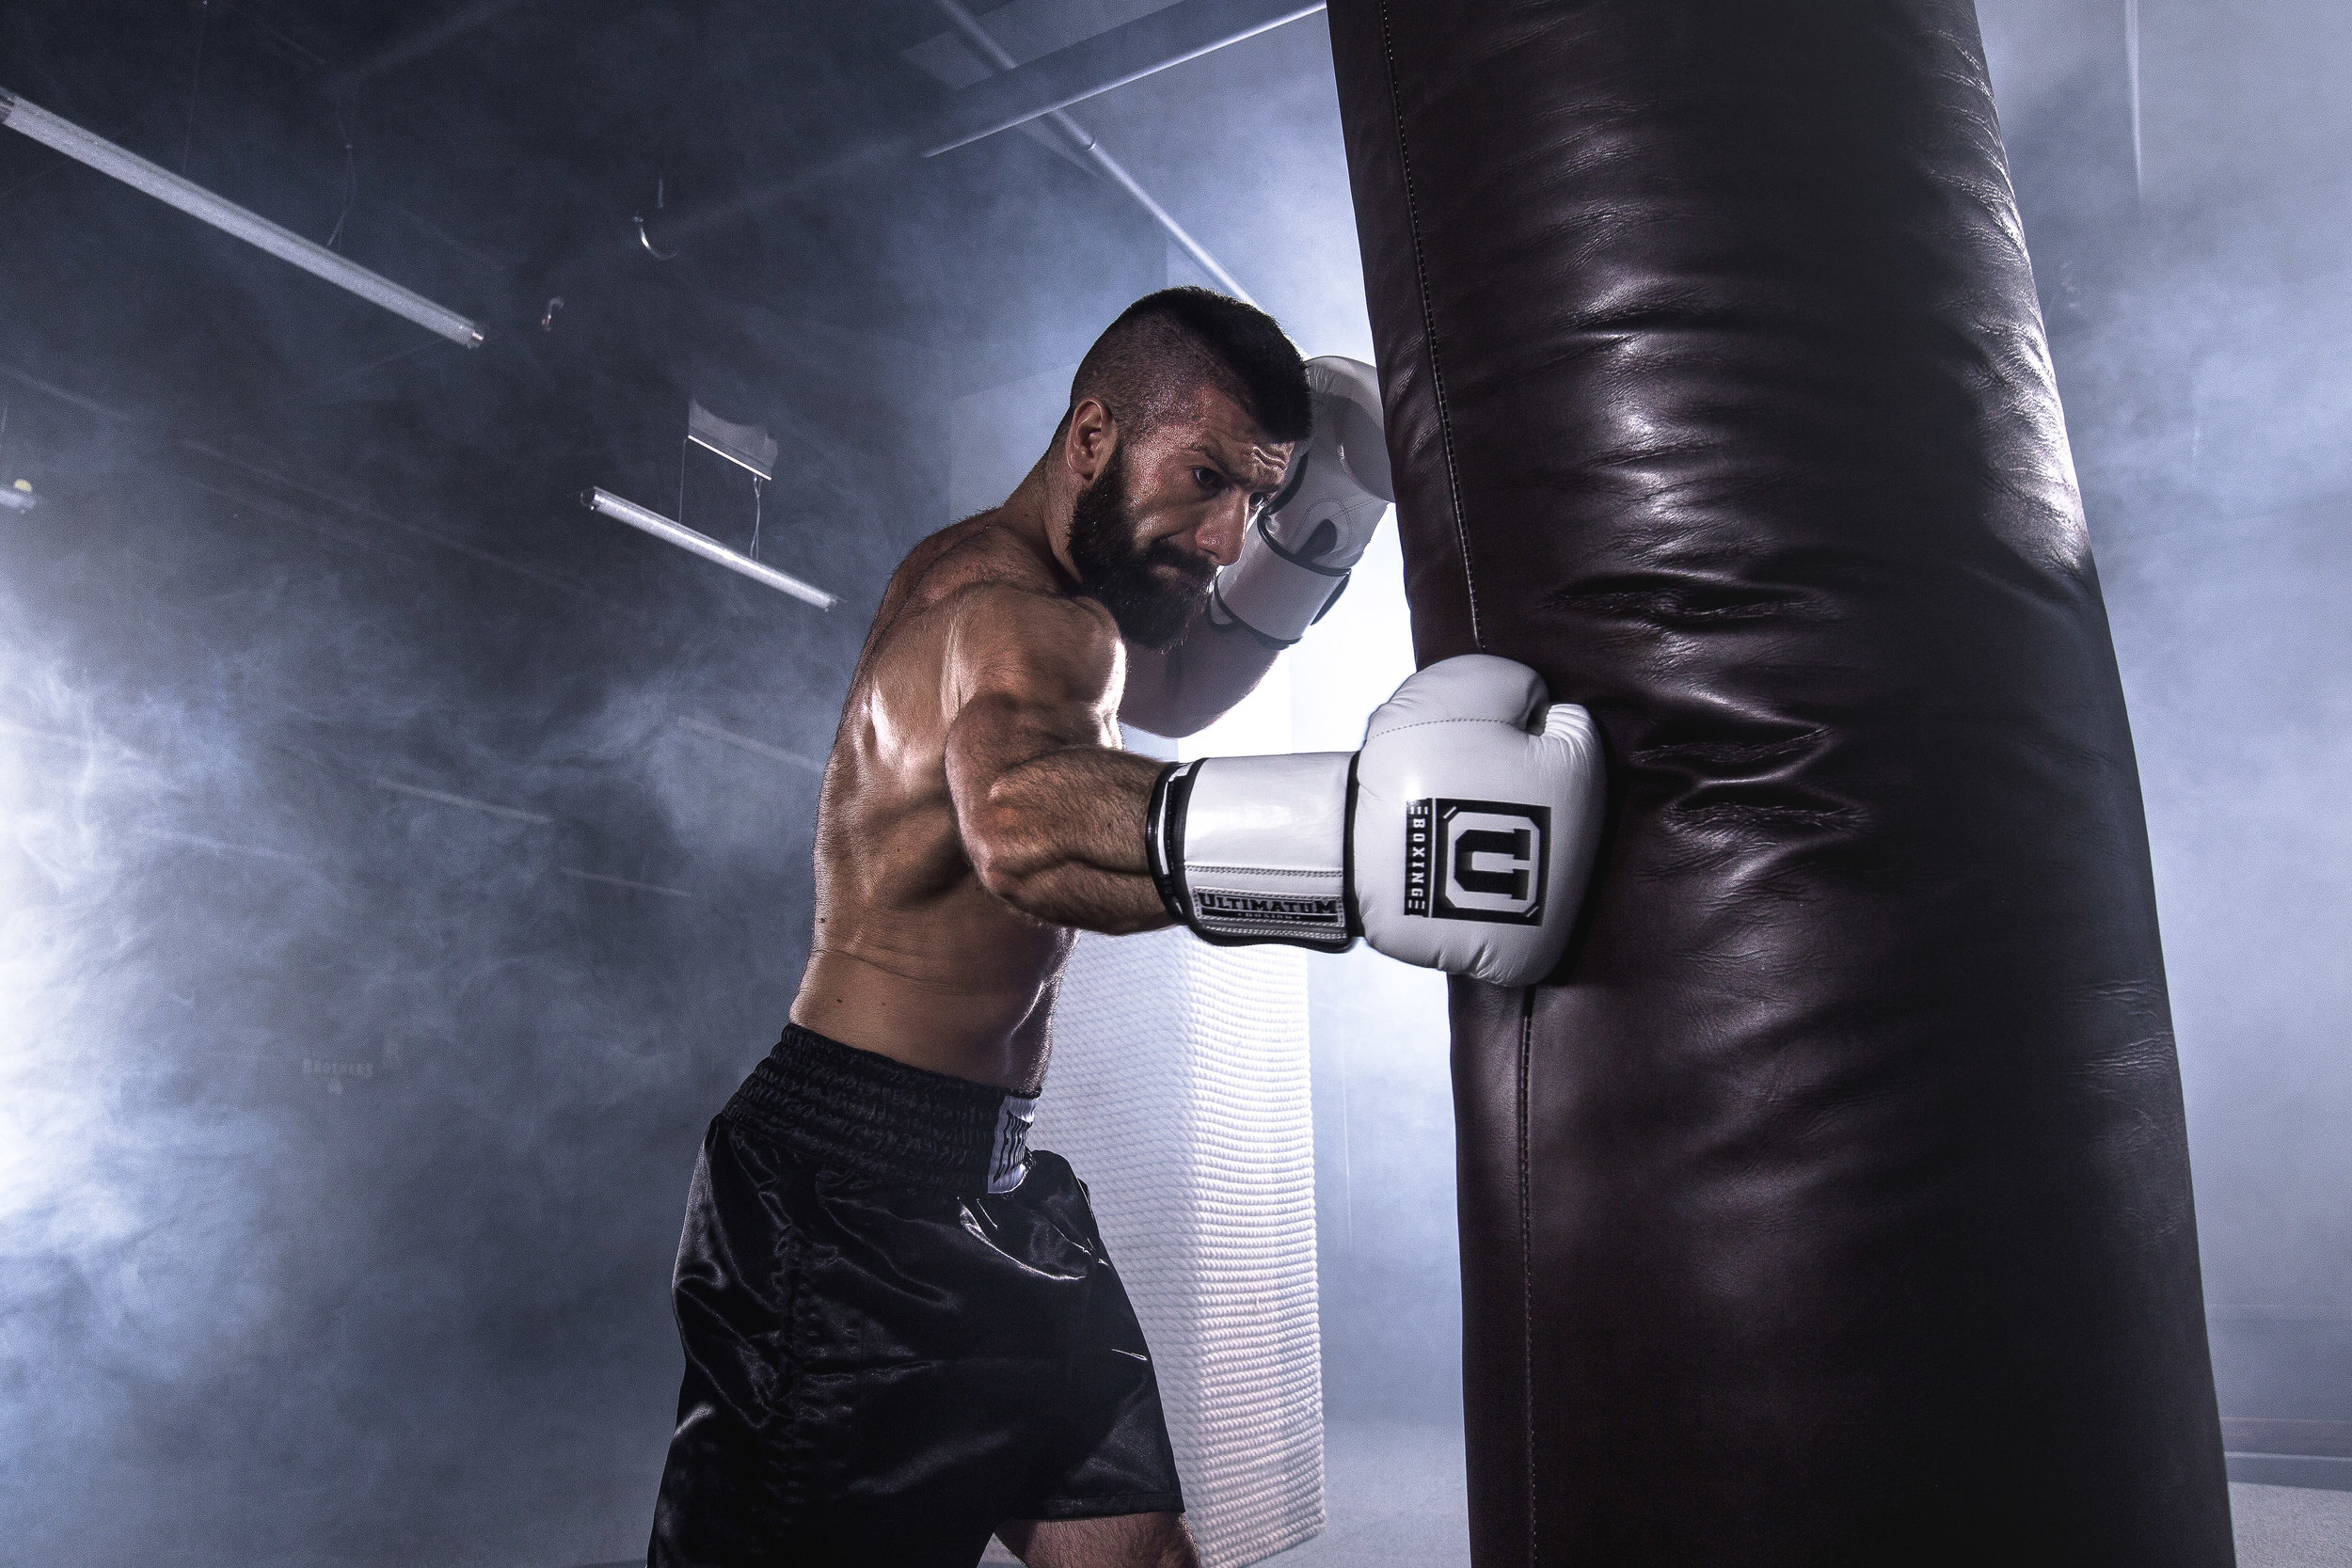 Misha De-Stroyev - Boxing 1.jpg